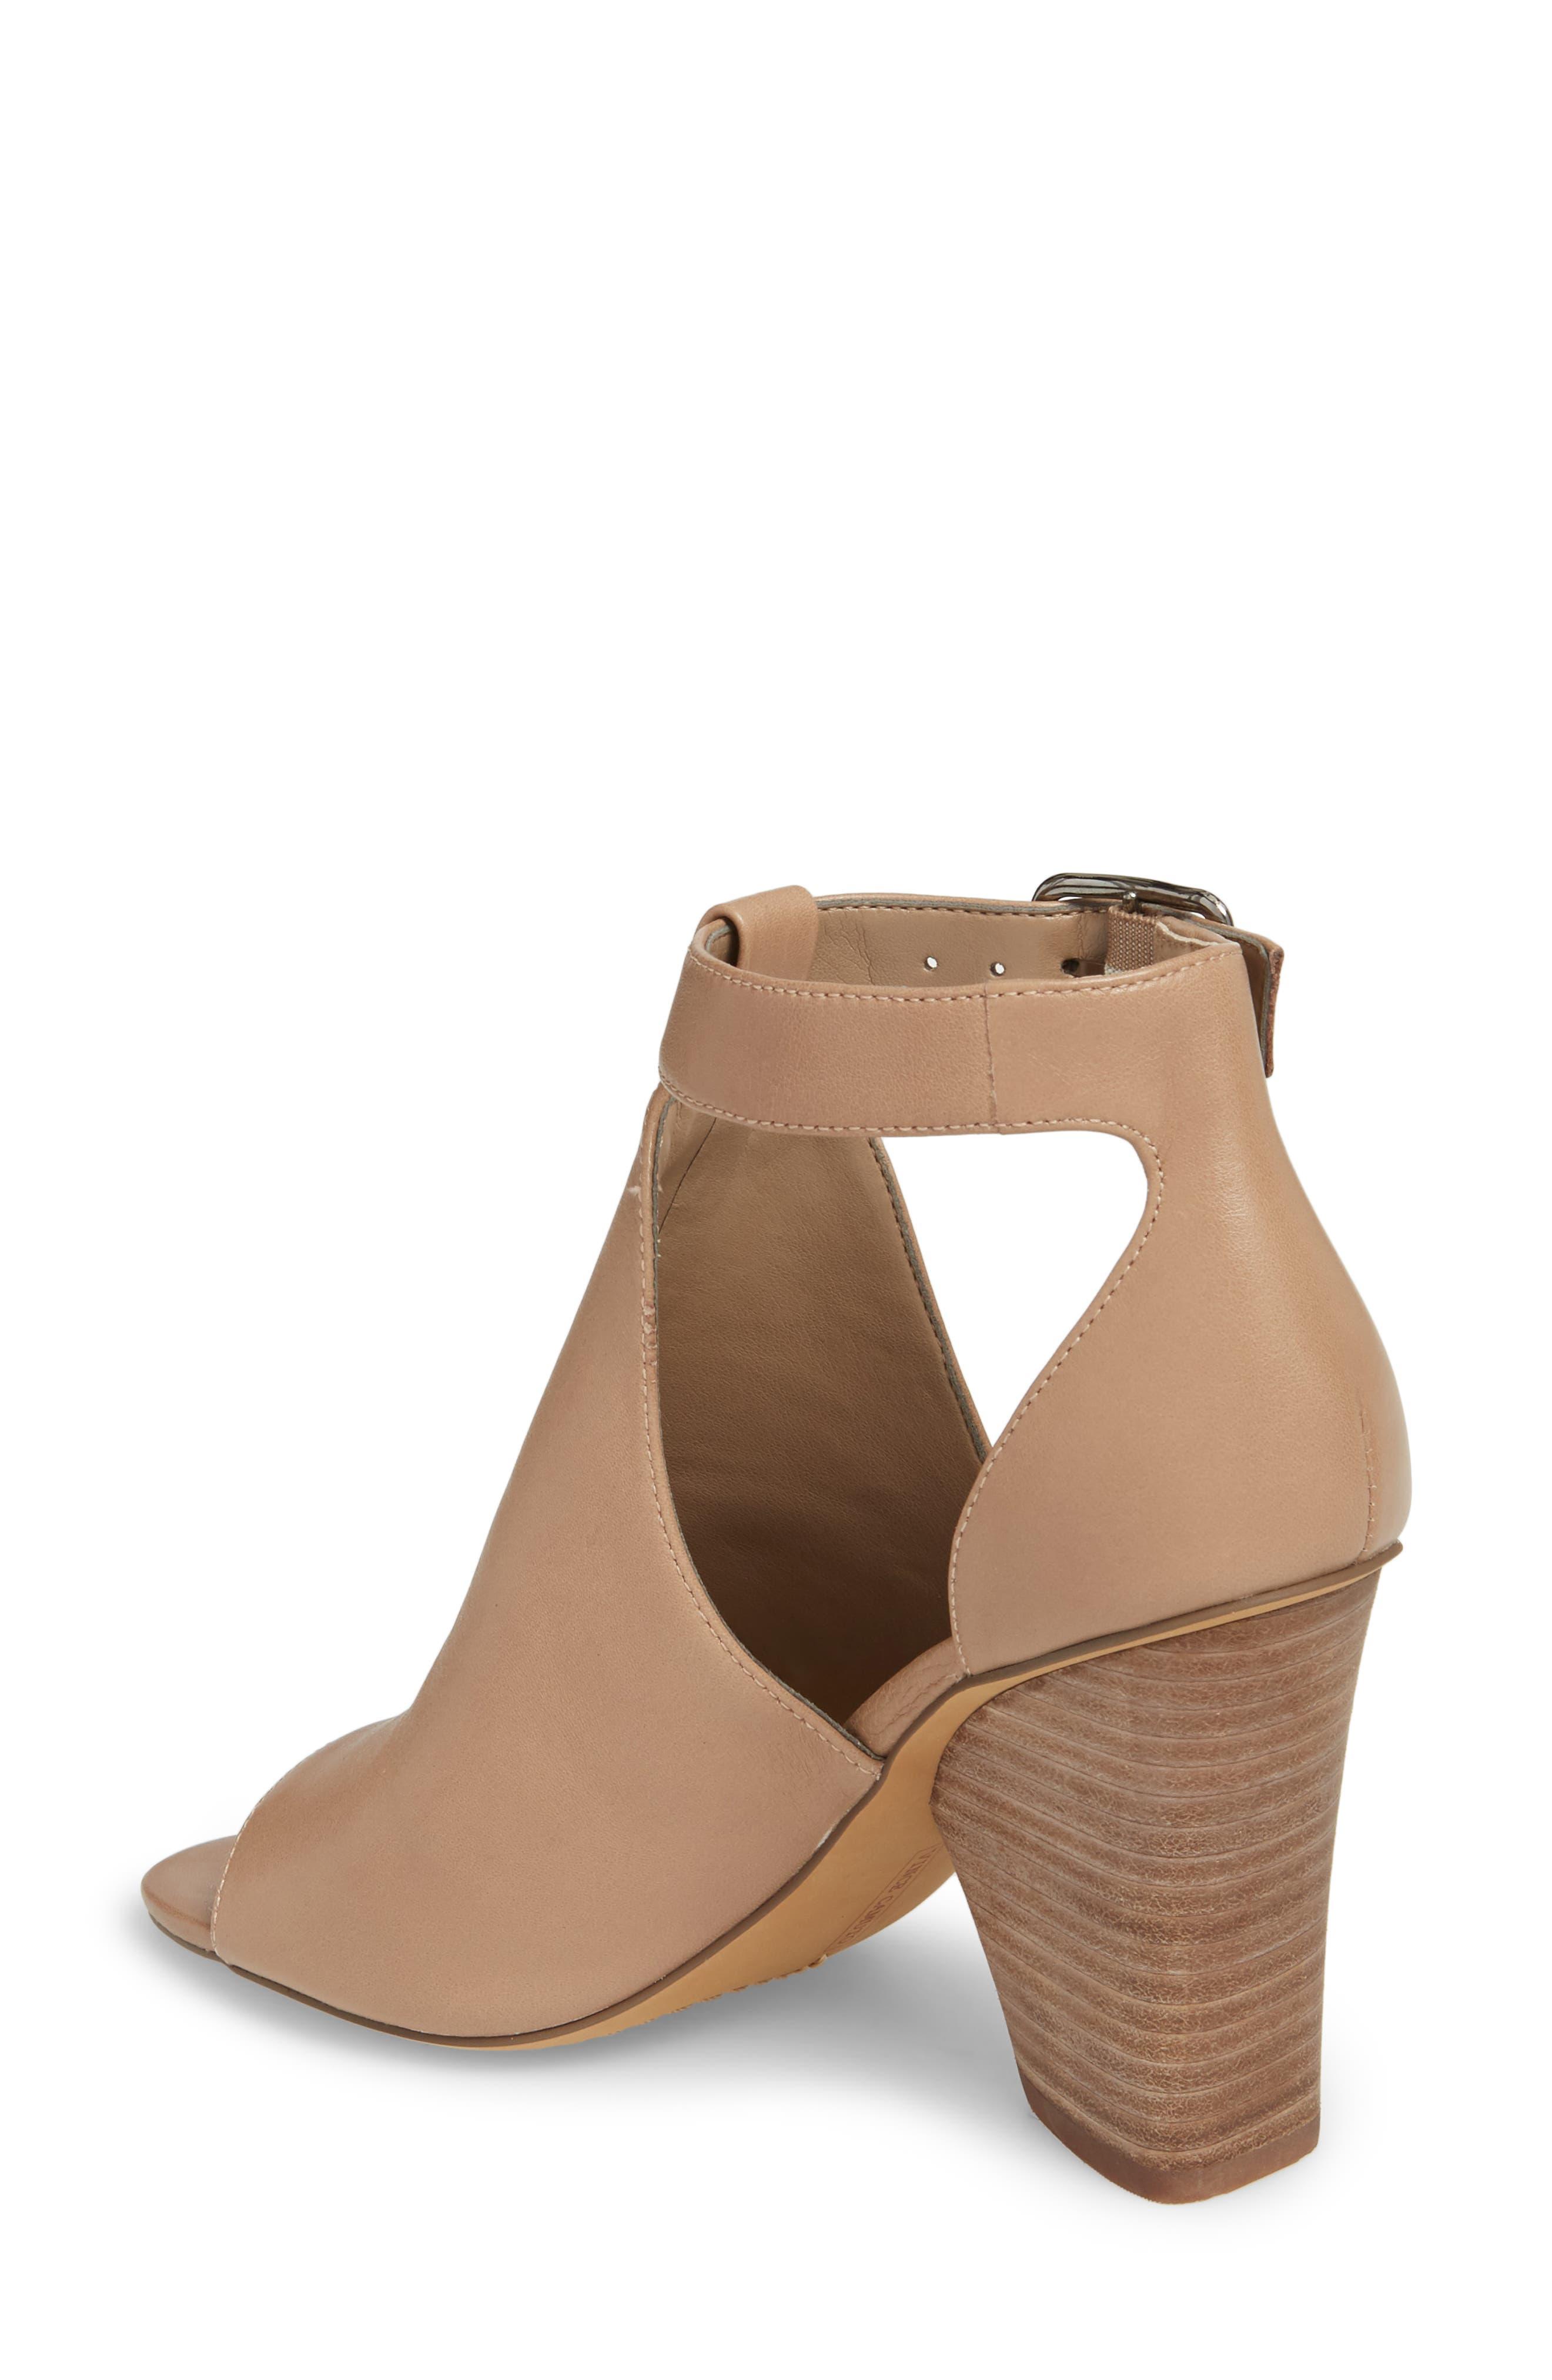 Adaren Peep Toe Sandal,                             Alternate thumbnail 2, color,                             Dusty Trail Leather